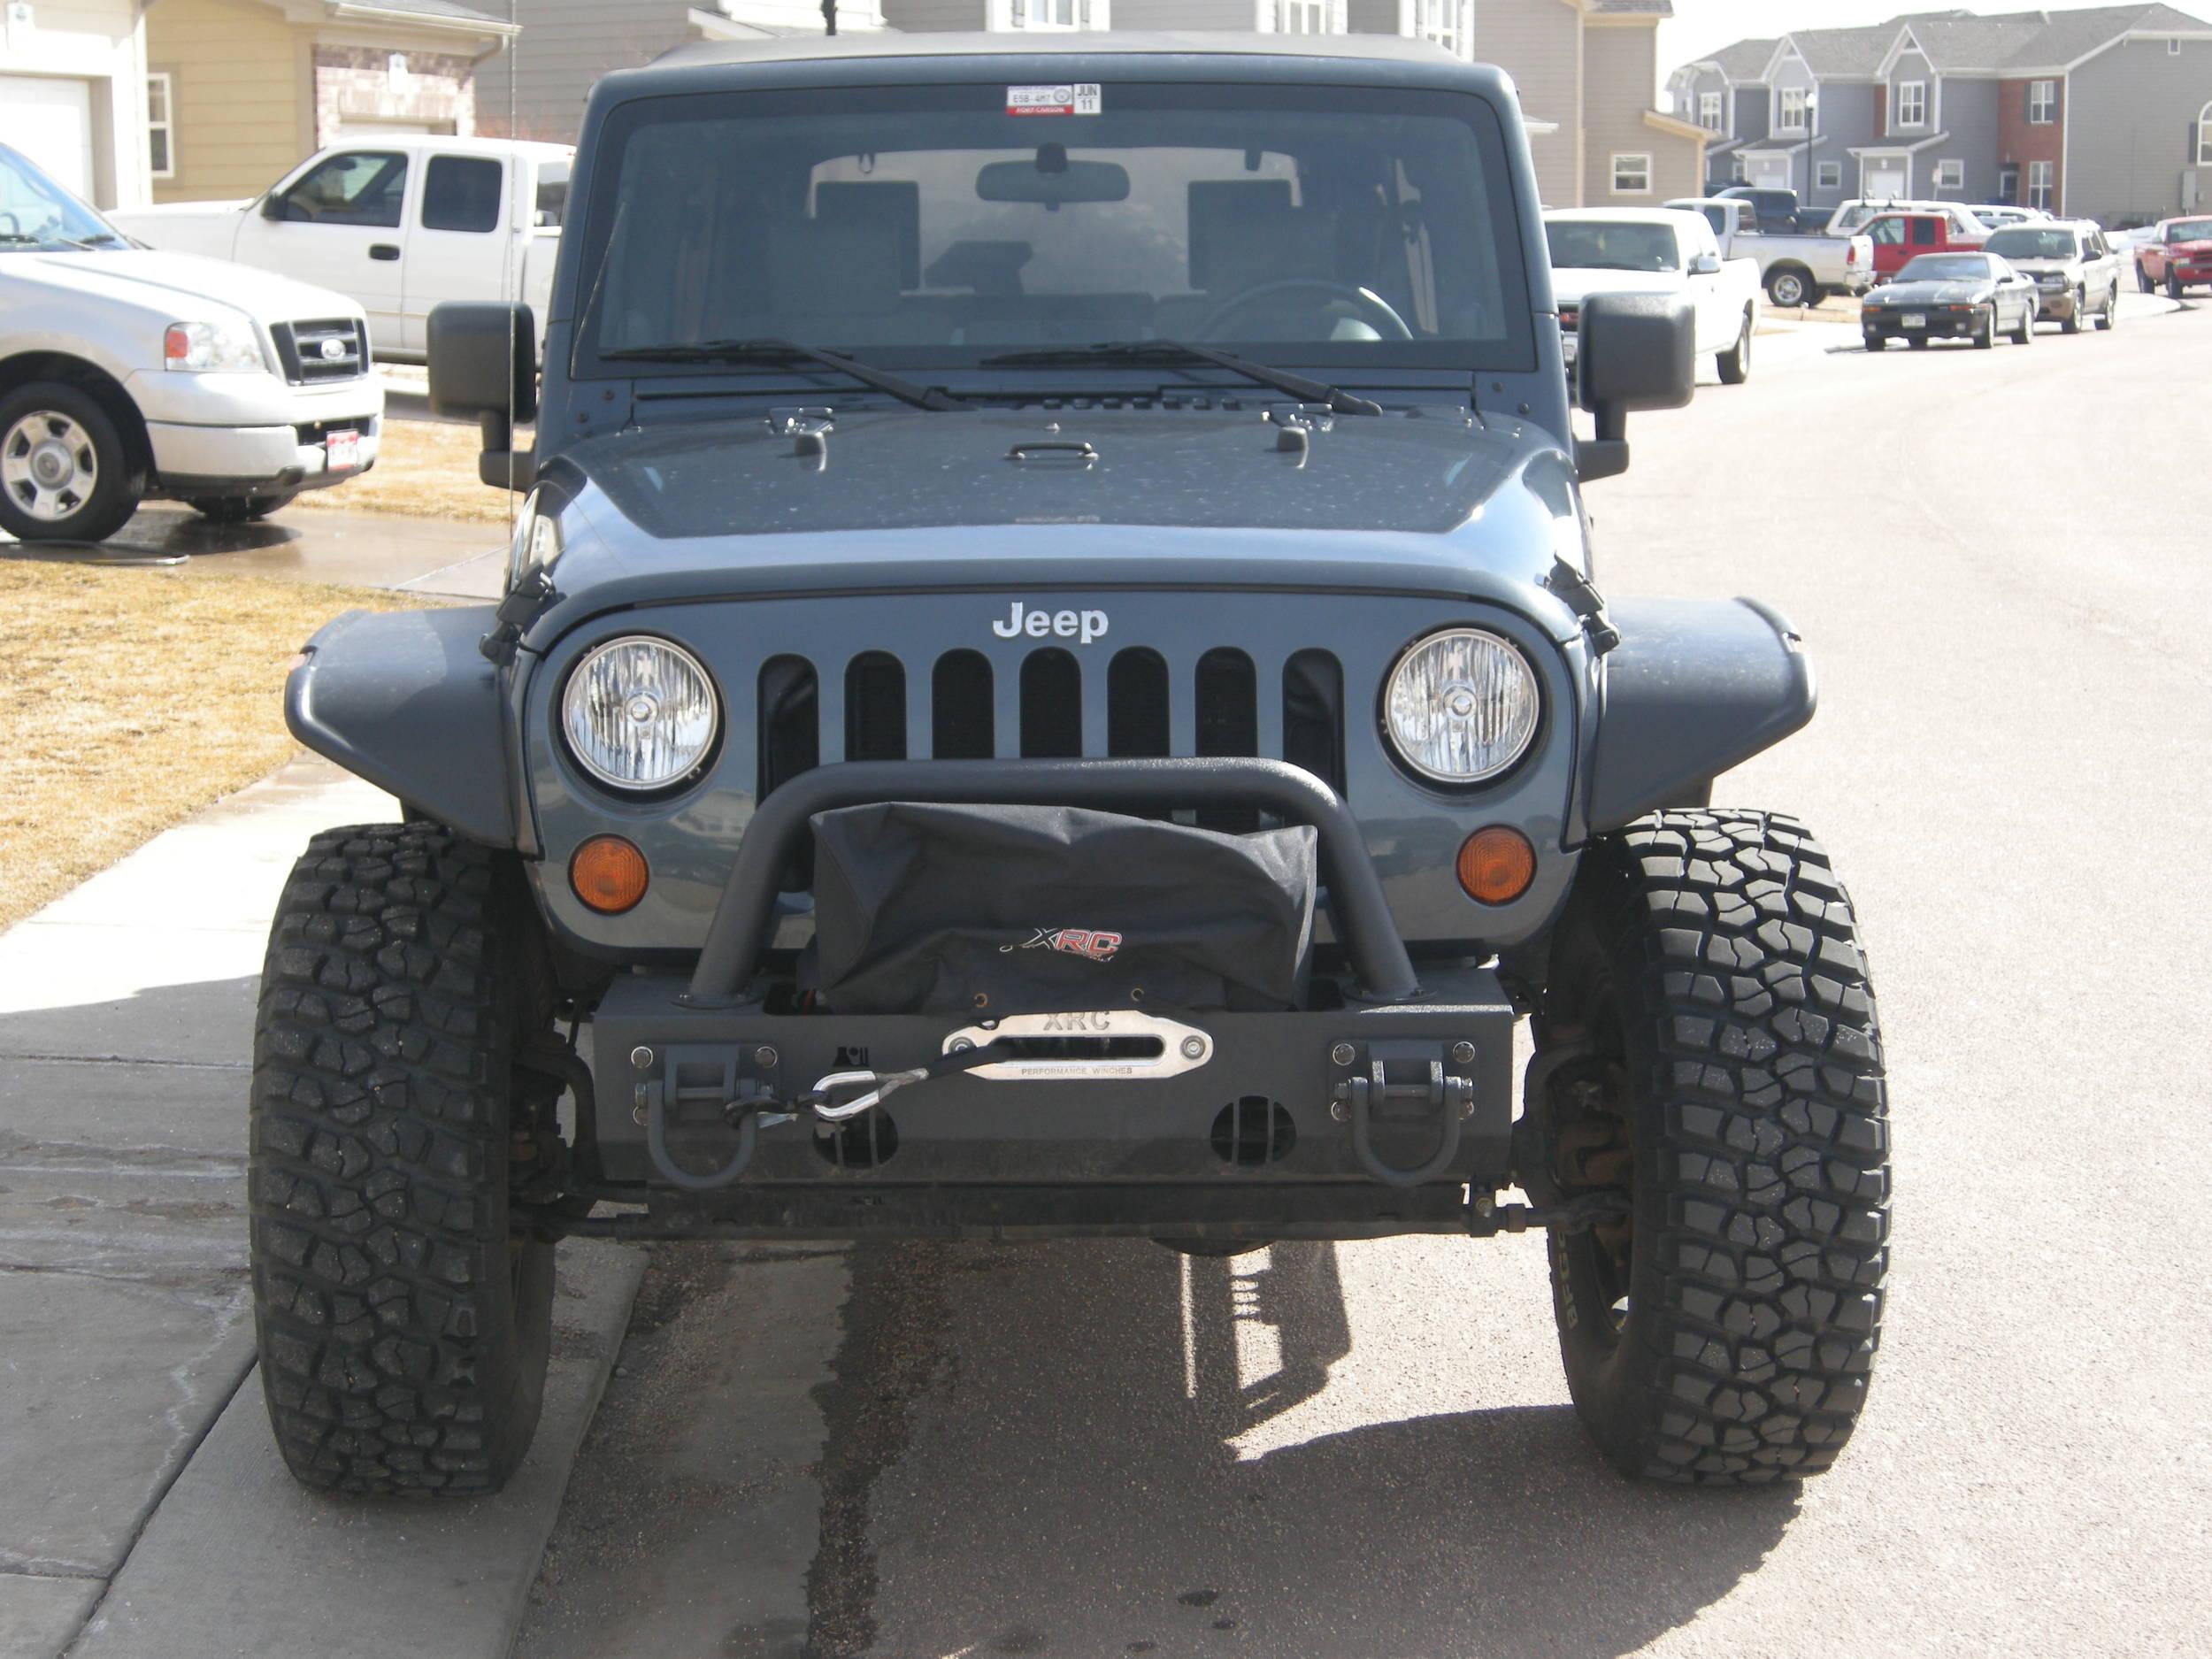 Jeep_00422.JPG